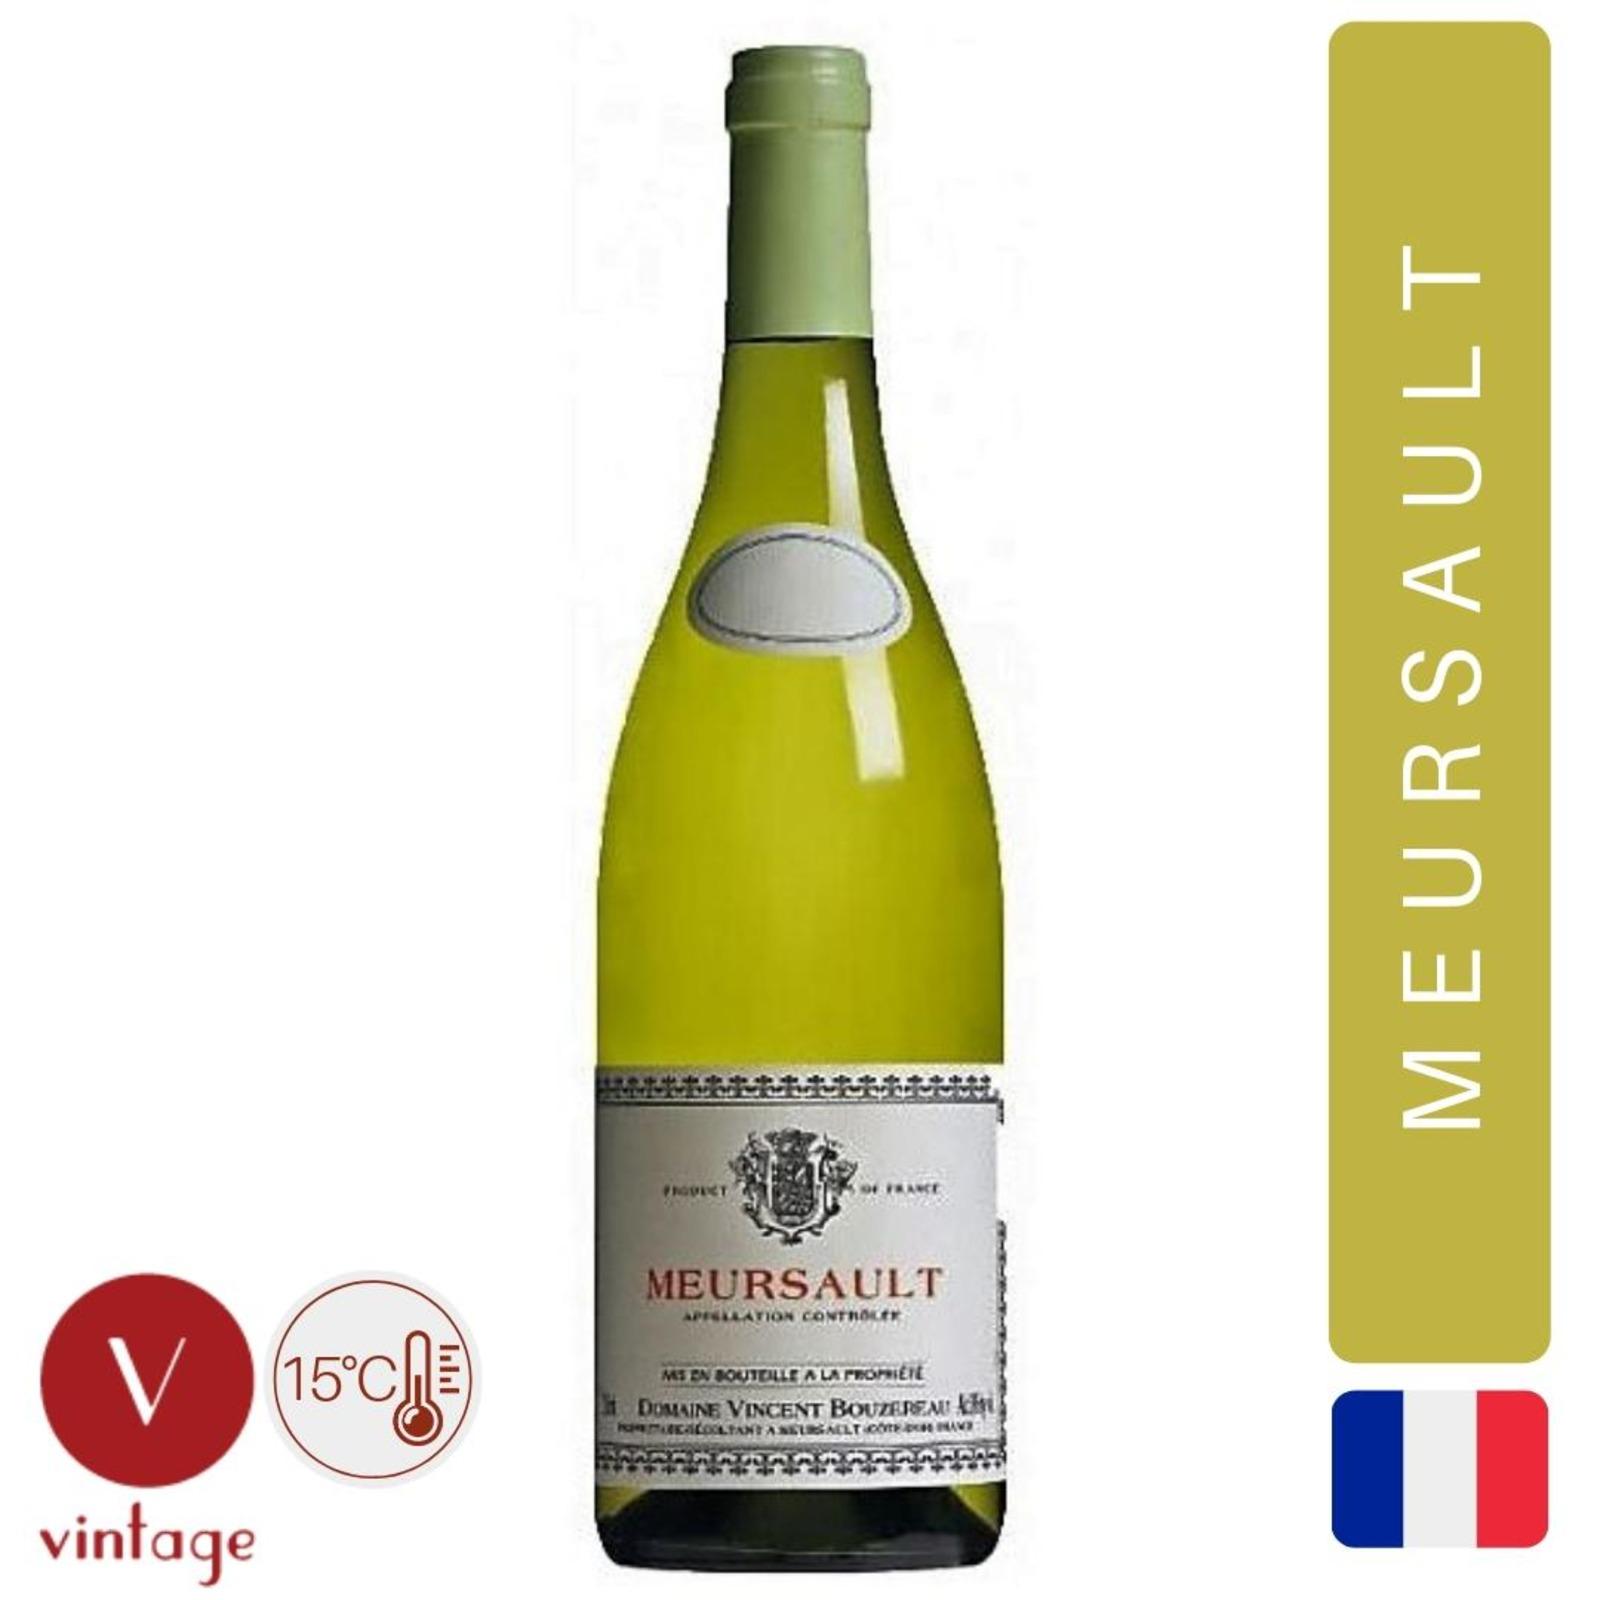 Vincent Bouzereau - Meursault - Burgundy - White Wine